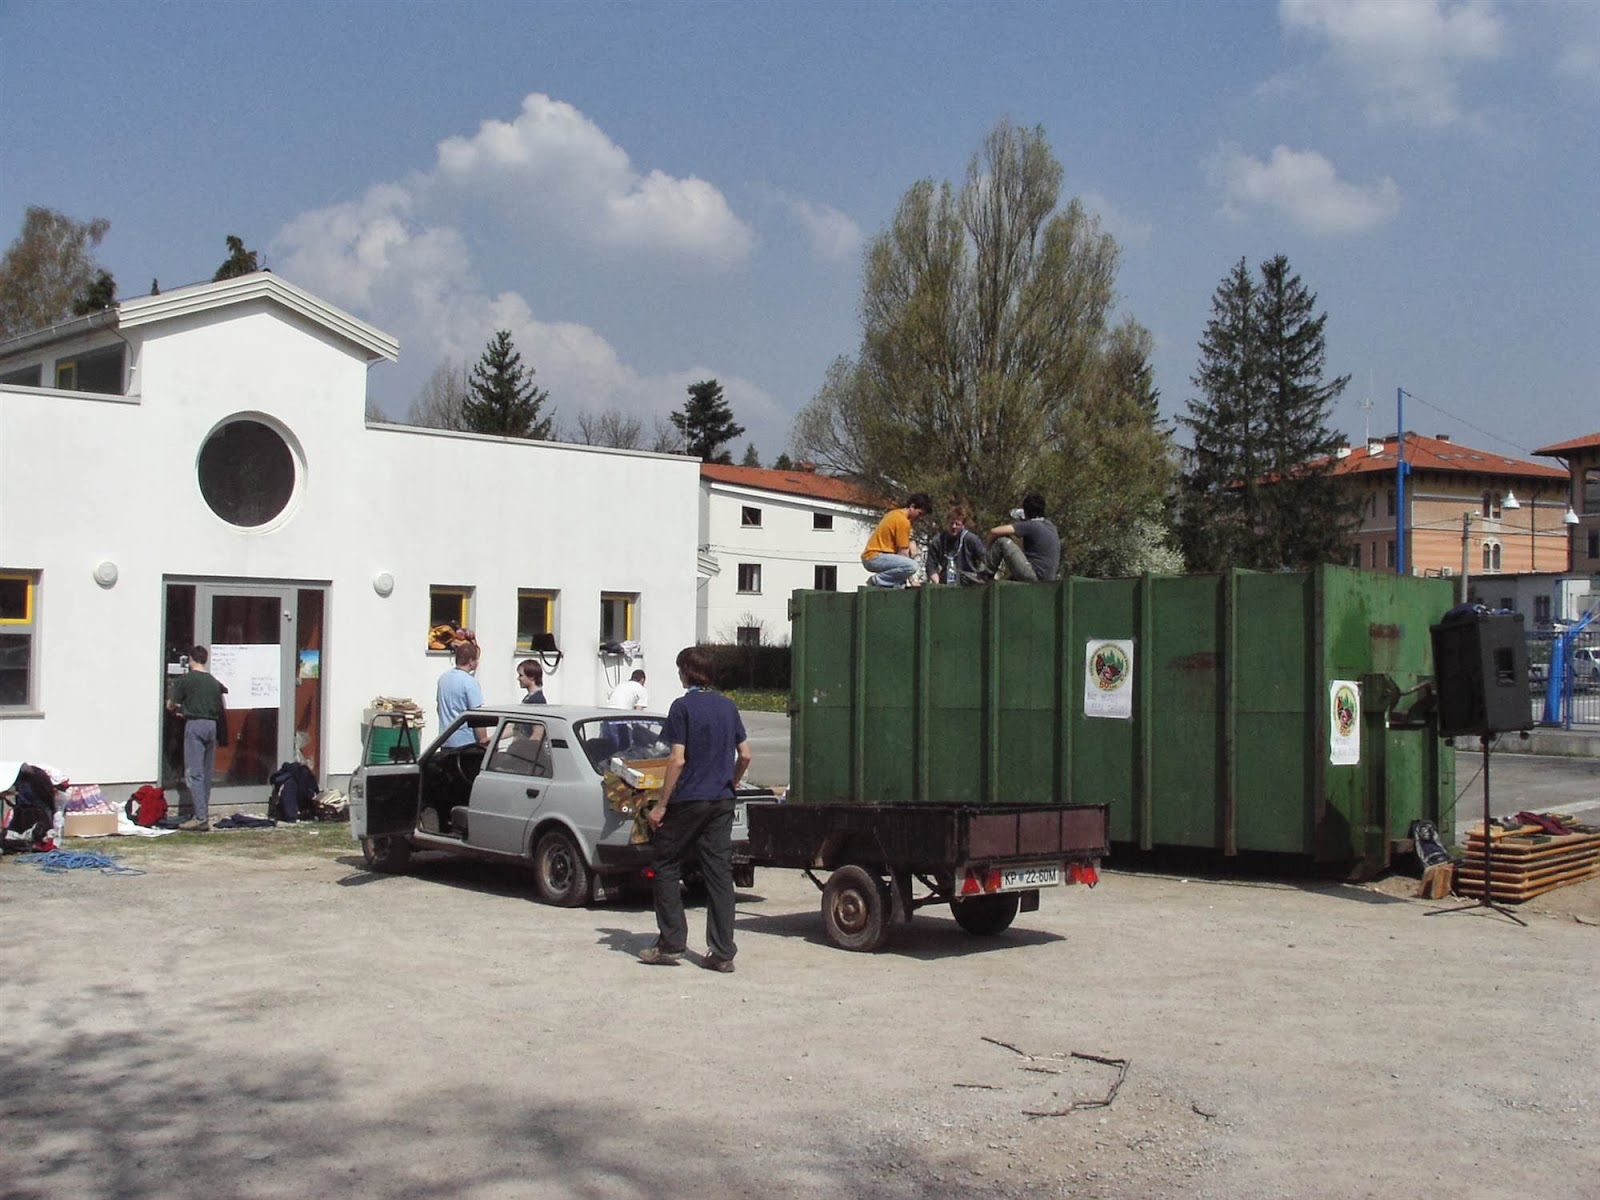 Zbiranje papirja, Ilirska Bistrica 2006 - KIF_8388.JPG